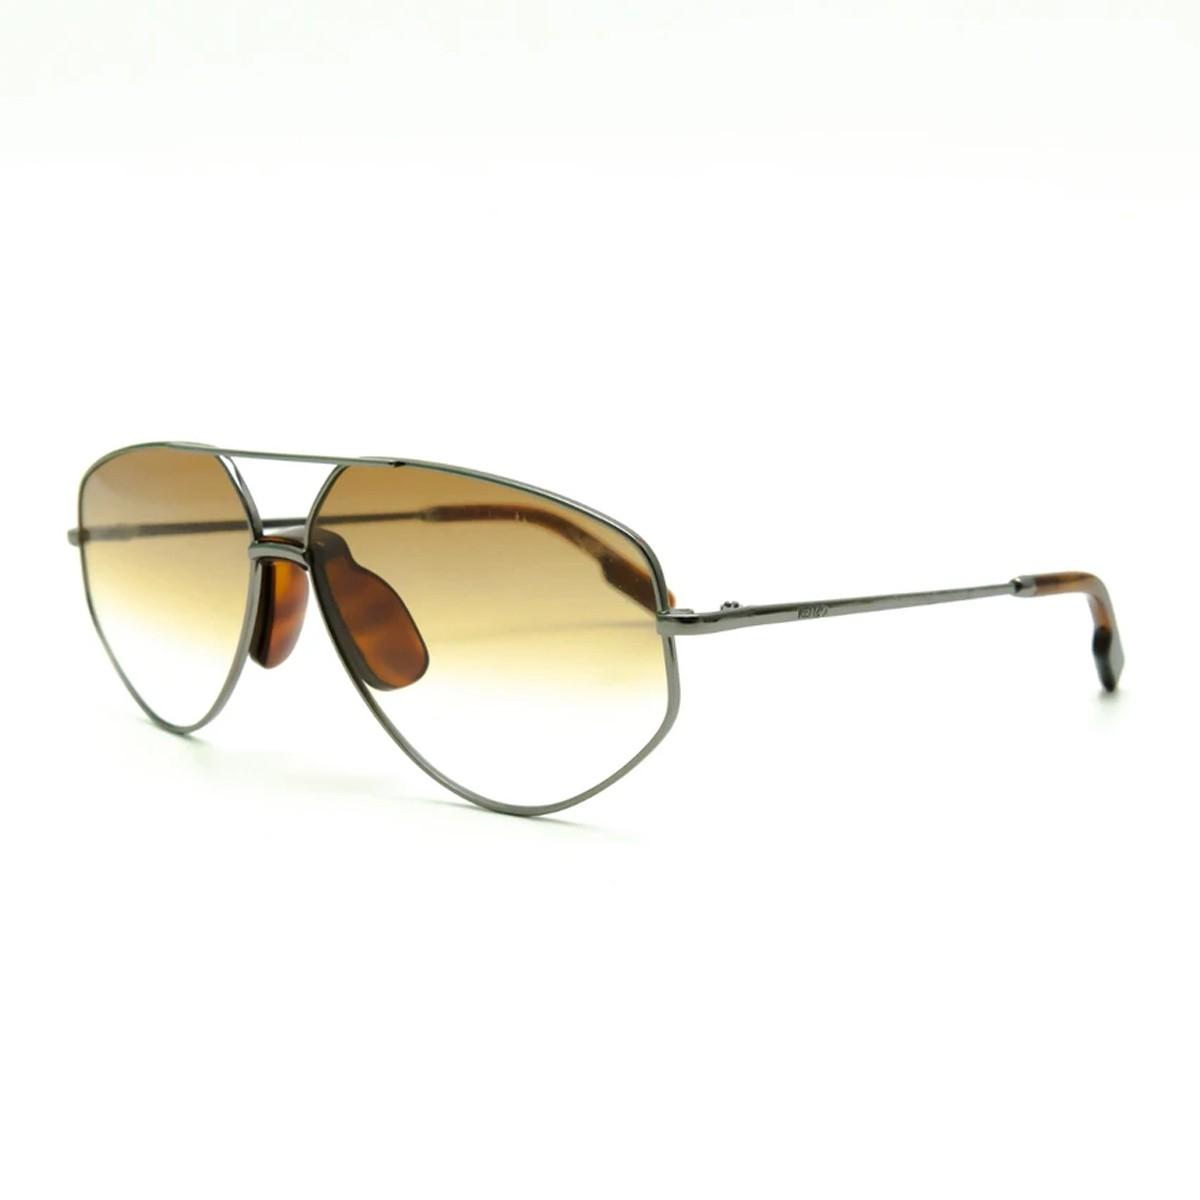 Kenzo KZ40014U   Unisex sunglasses